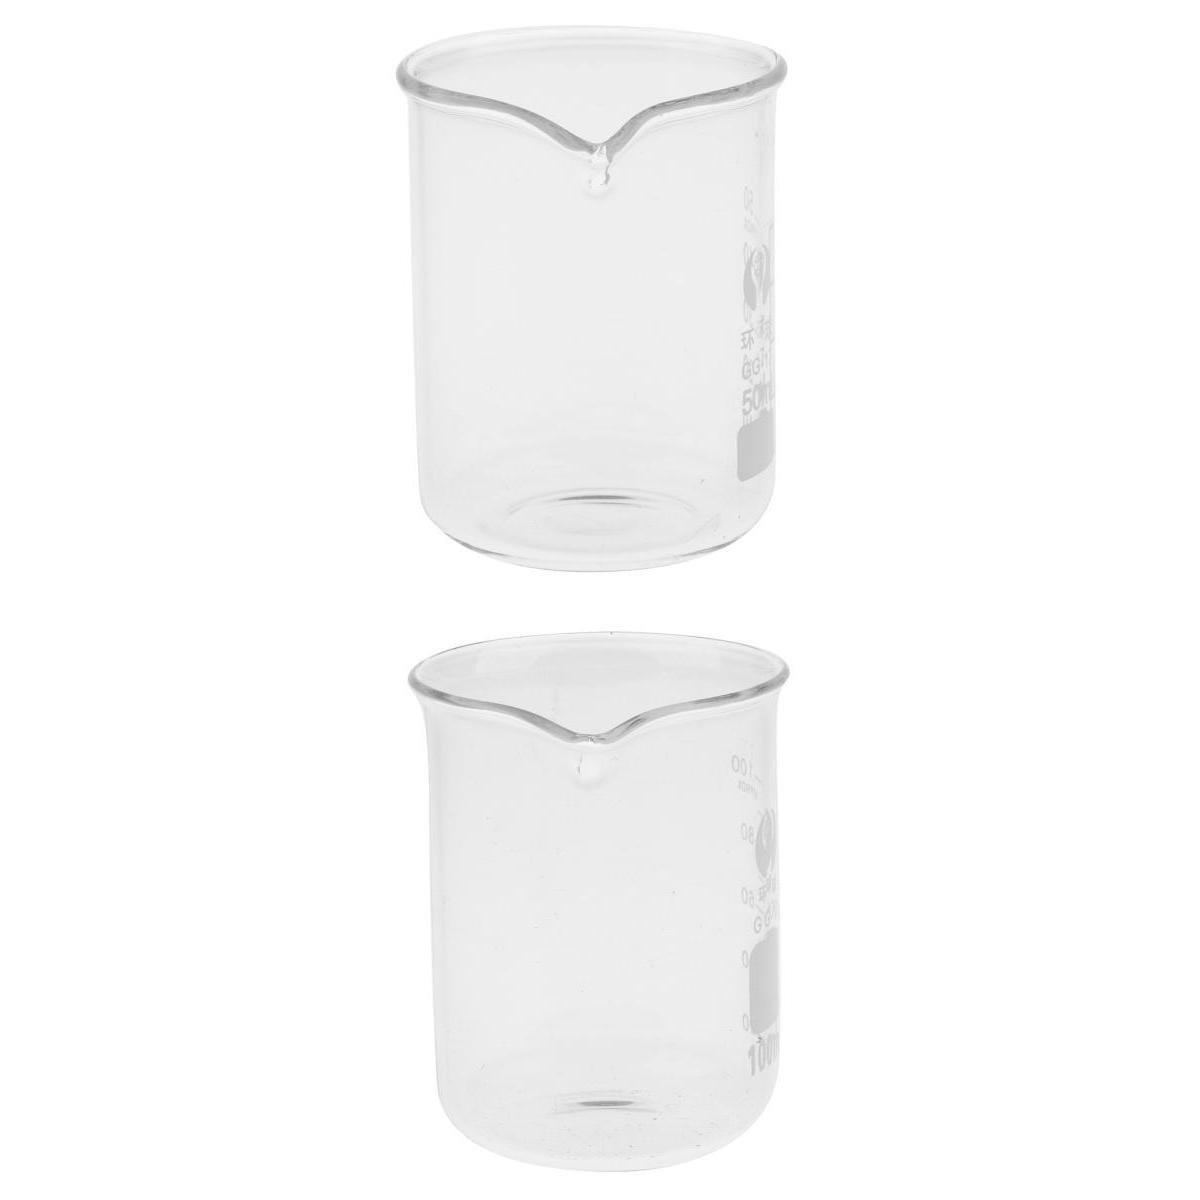 MagiDeal 50ml 100ml Glass Beaker Measuring Beaker Lab Borosilicate Glassware Heat and Thermal Resistant non-brand